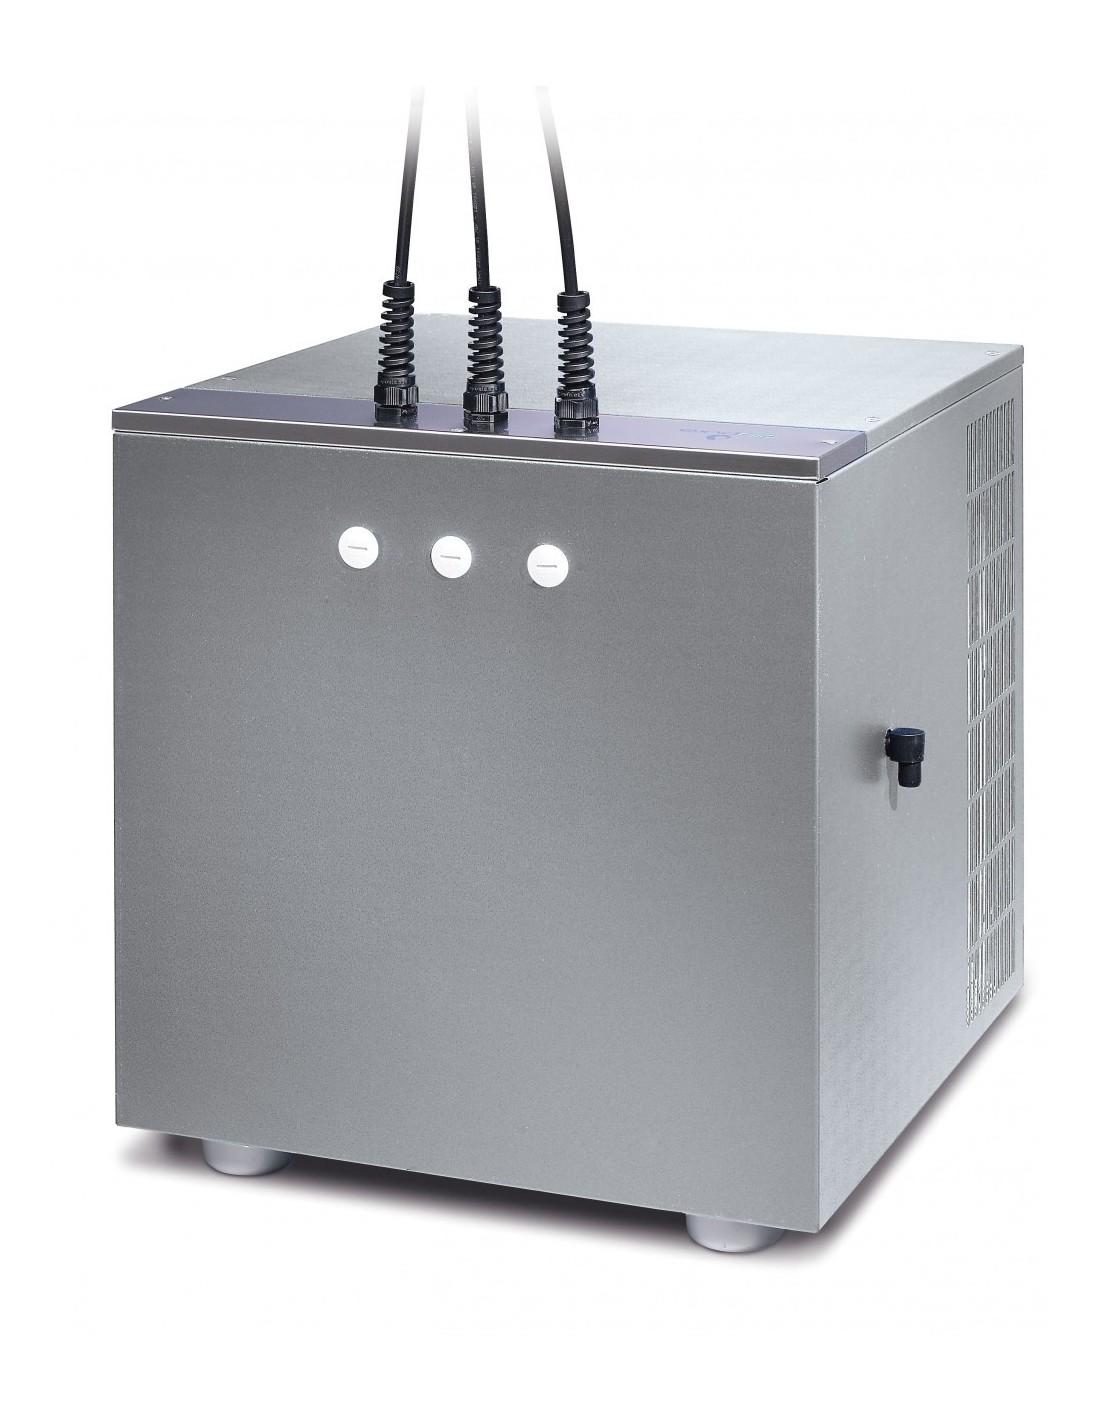 UPP00111 - Kolsyrat vatten - Blupura Blusoda Box Fizz 150